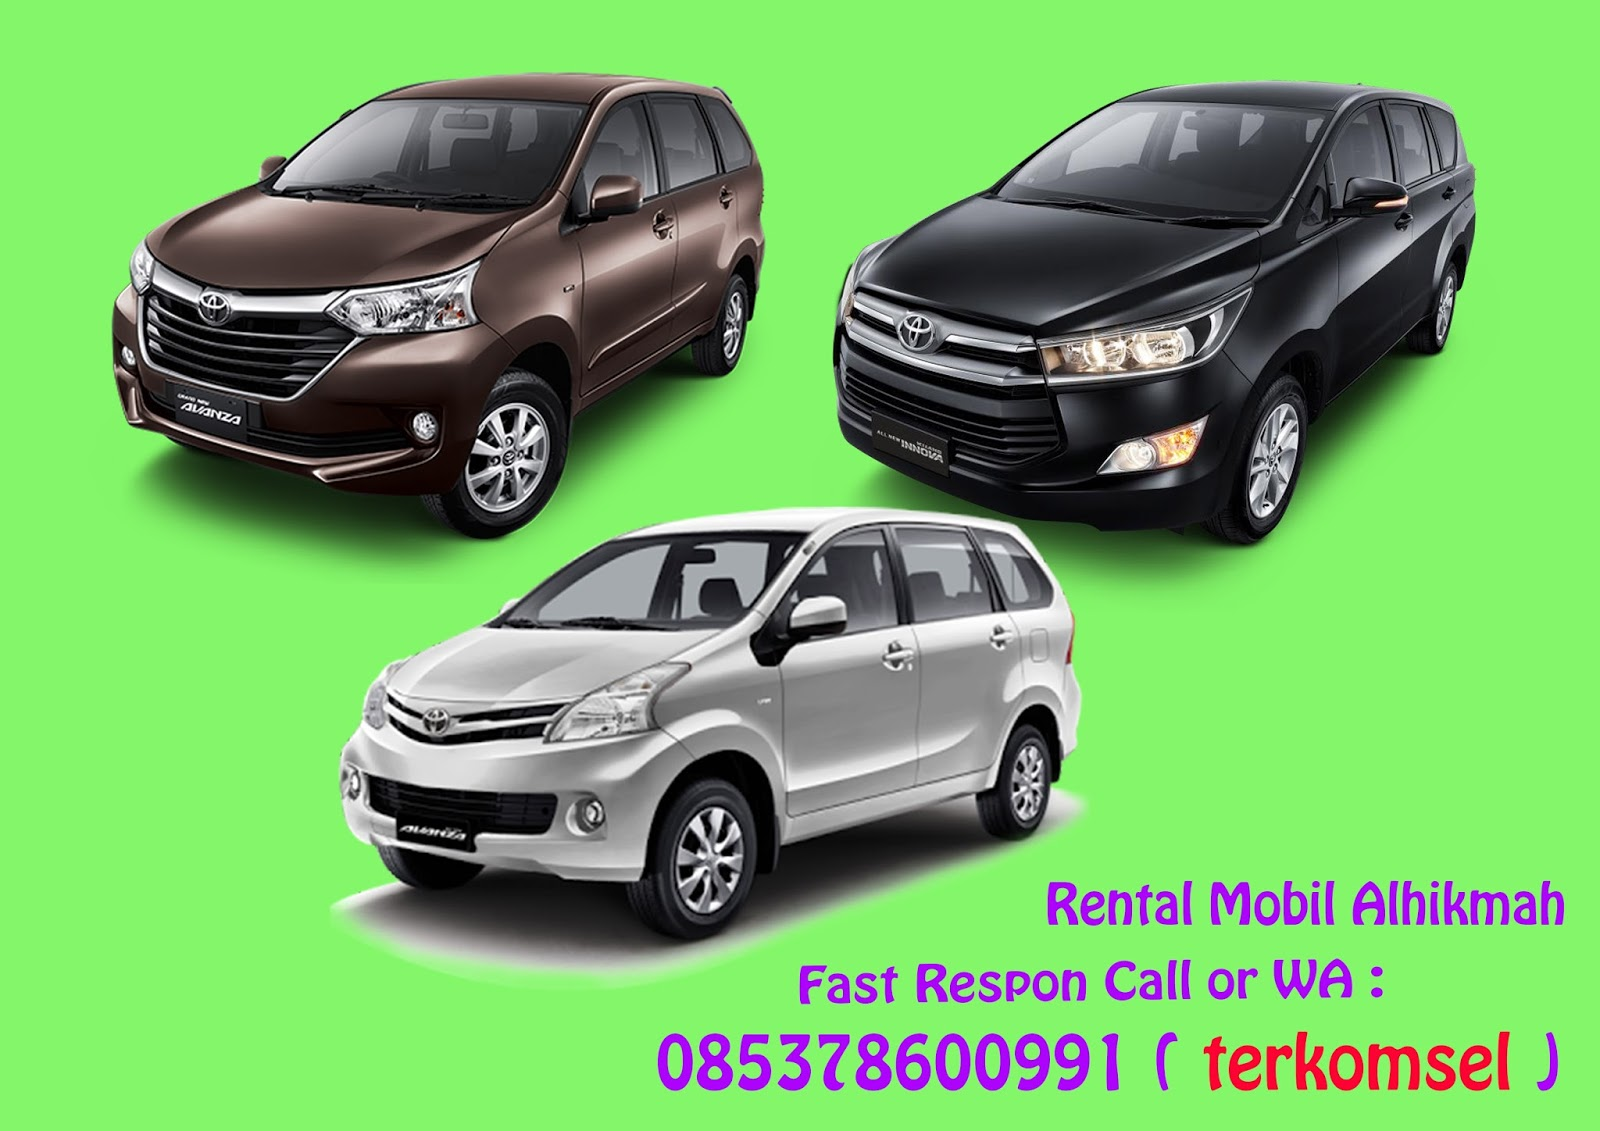 Sewa Mobil Grand New Avanza Jogja Jual Rental Palembang Murah Jasa